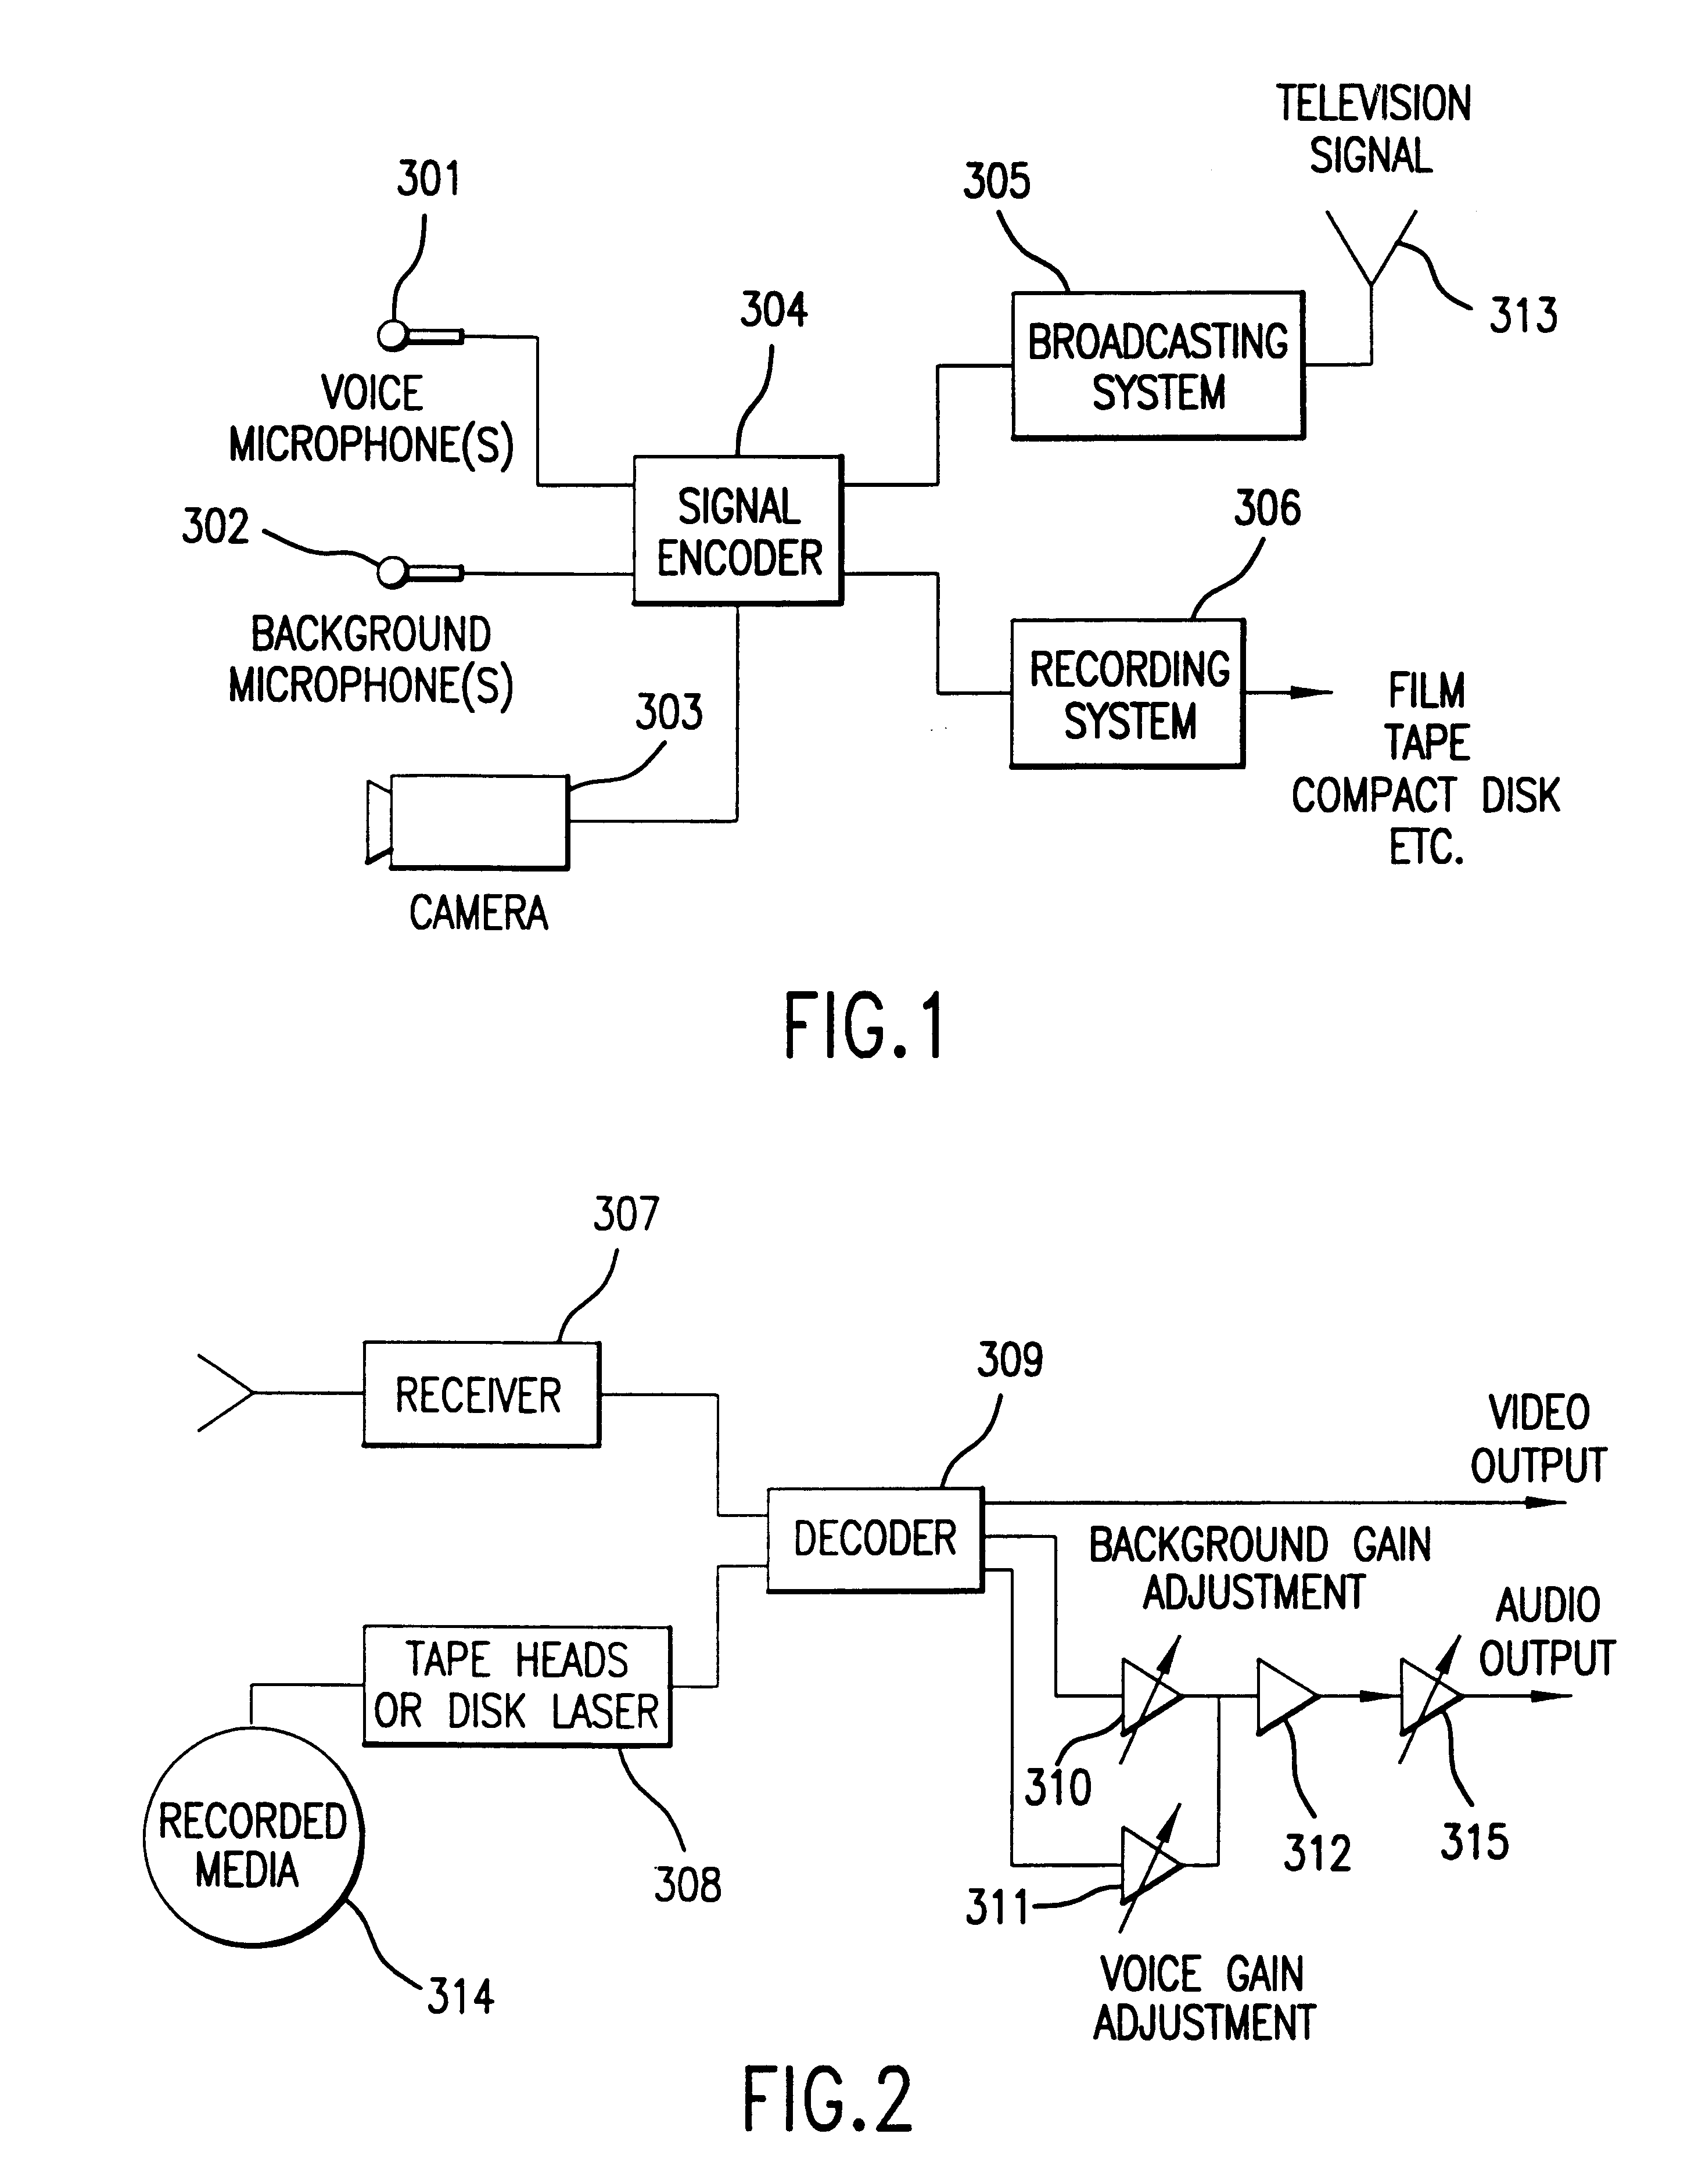 patent us 6 311 155 b1 DC Diagram patent images patent images